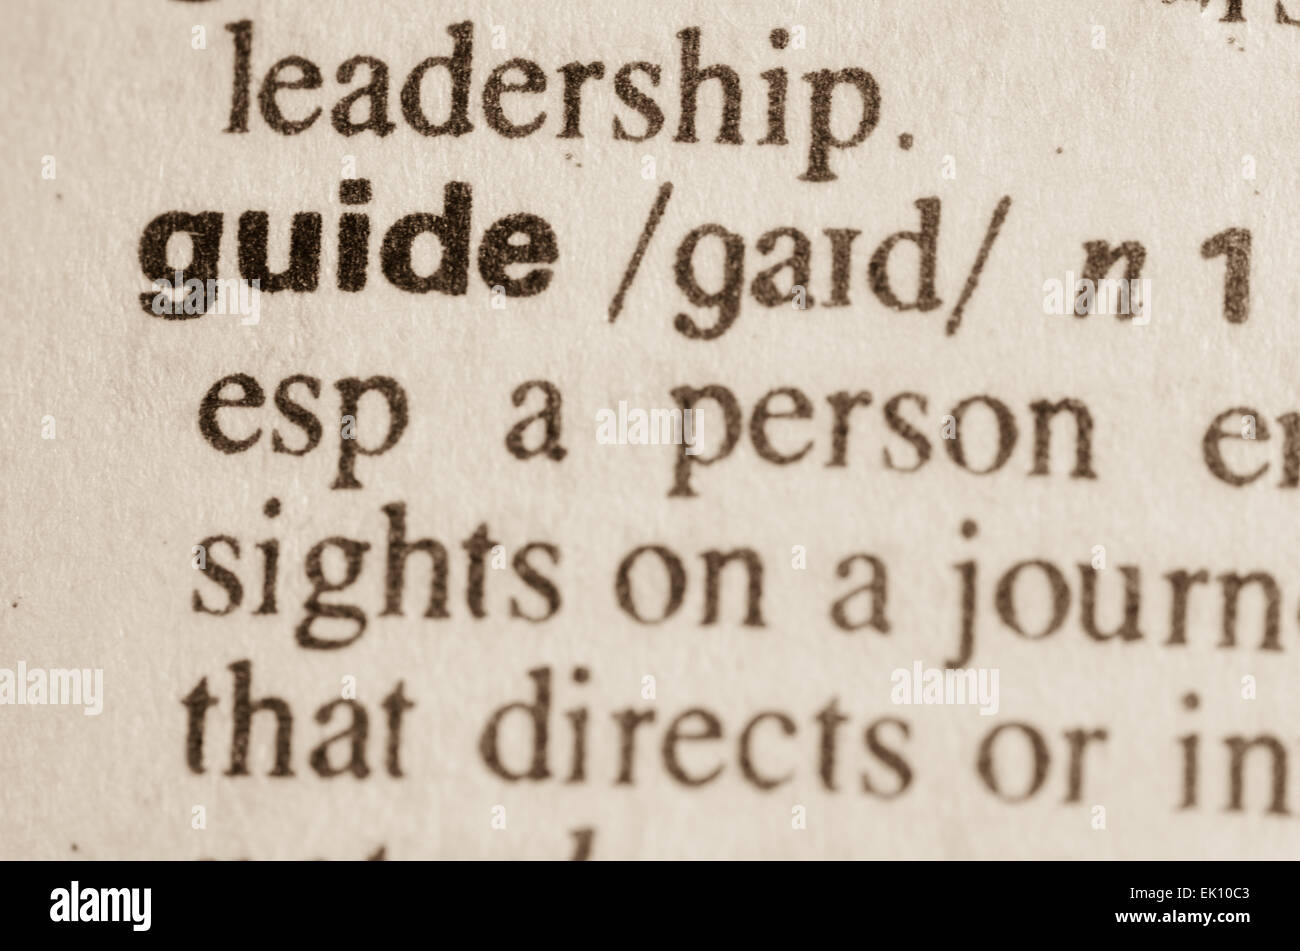 Dictionary and guide im genes de stock dictionary and for Significado de la palabra contemporaneo